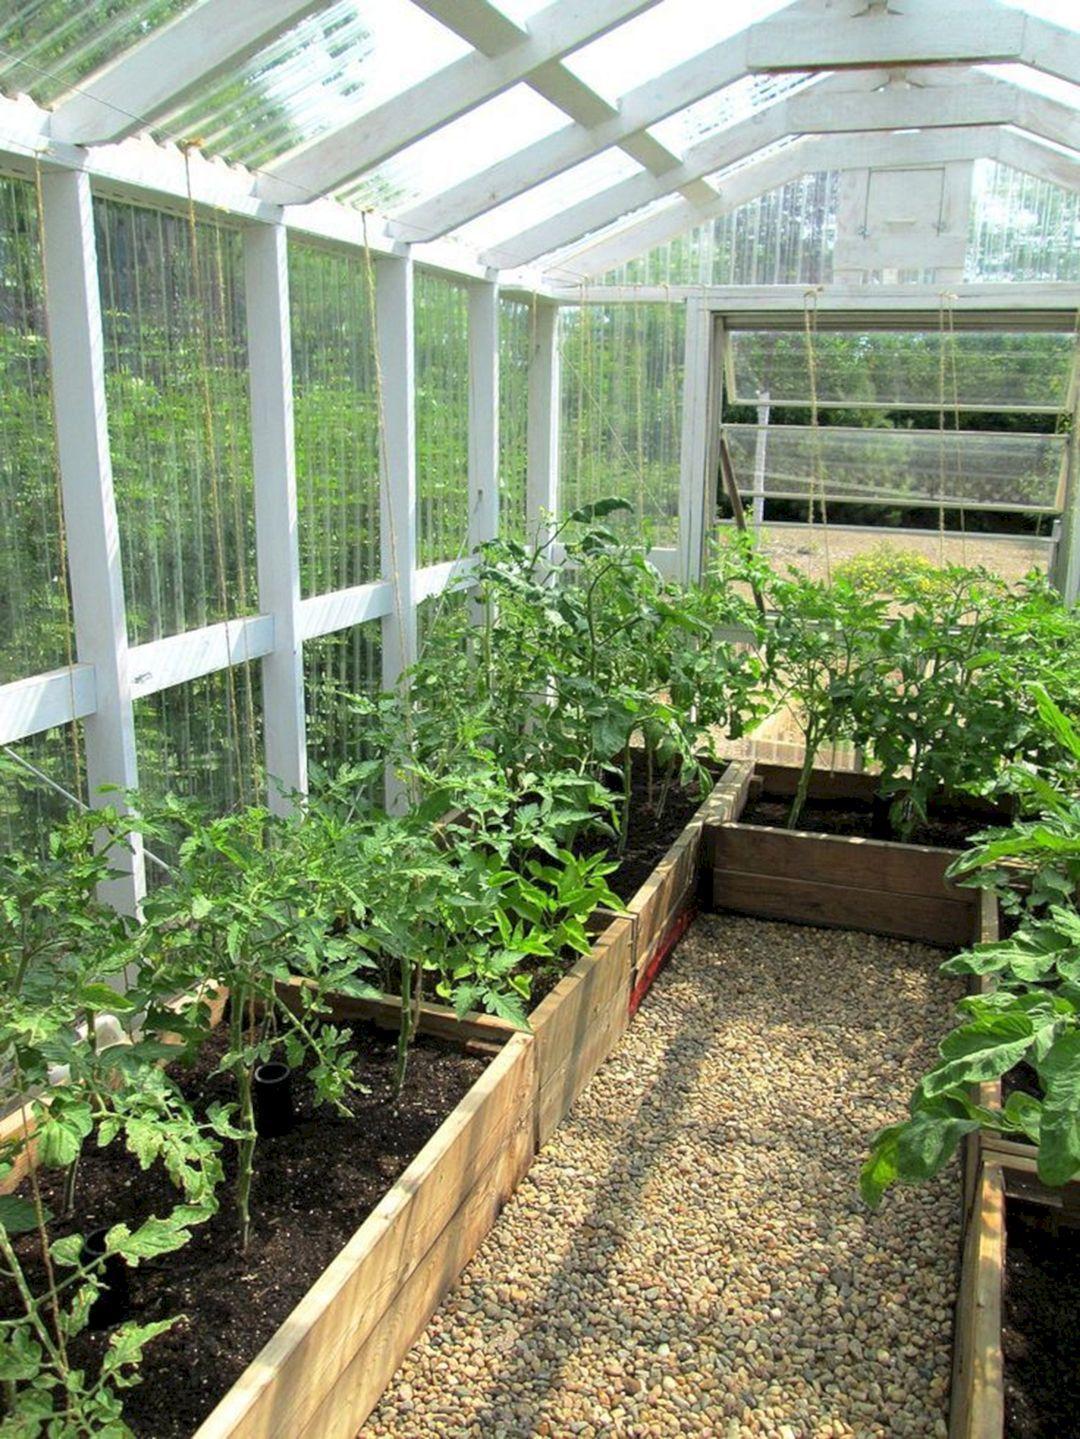 30 Beautiful Backyard Garden Design With Small Greenhouse Ideas Freshouz Com Diy Greenhouse Plans Backyard Greenhouse Build A Greenhouse